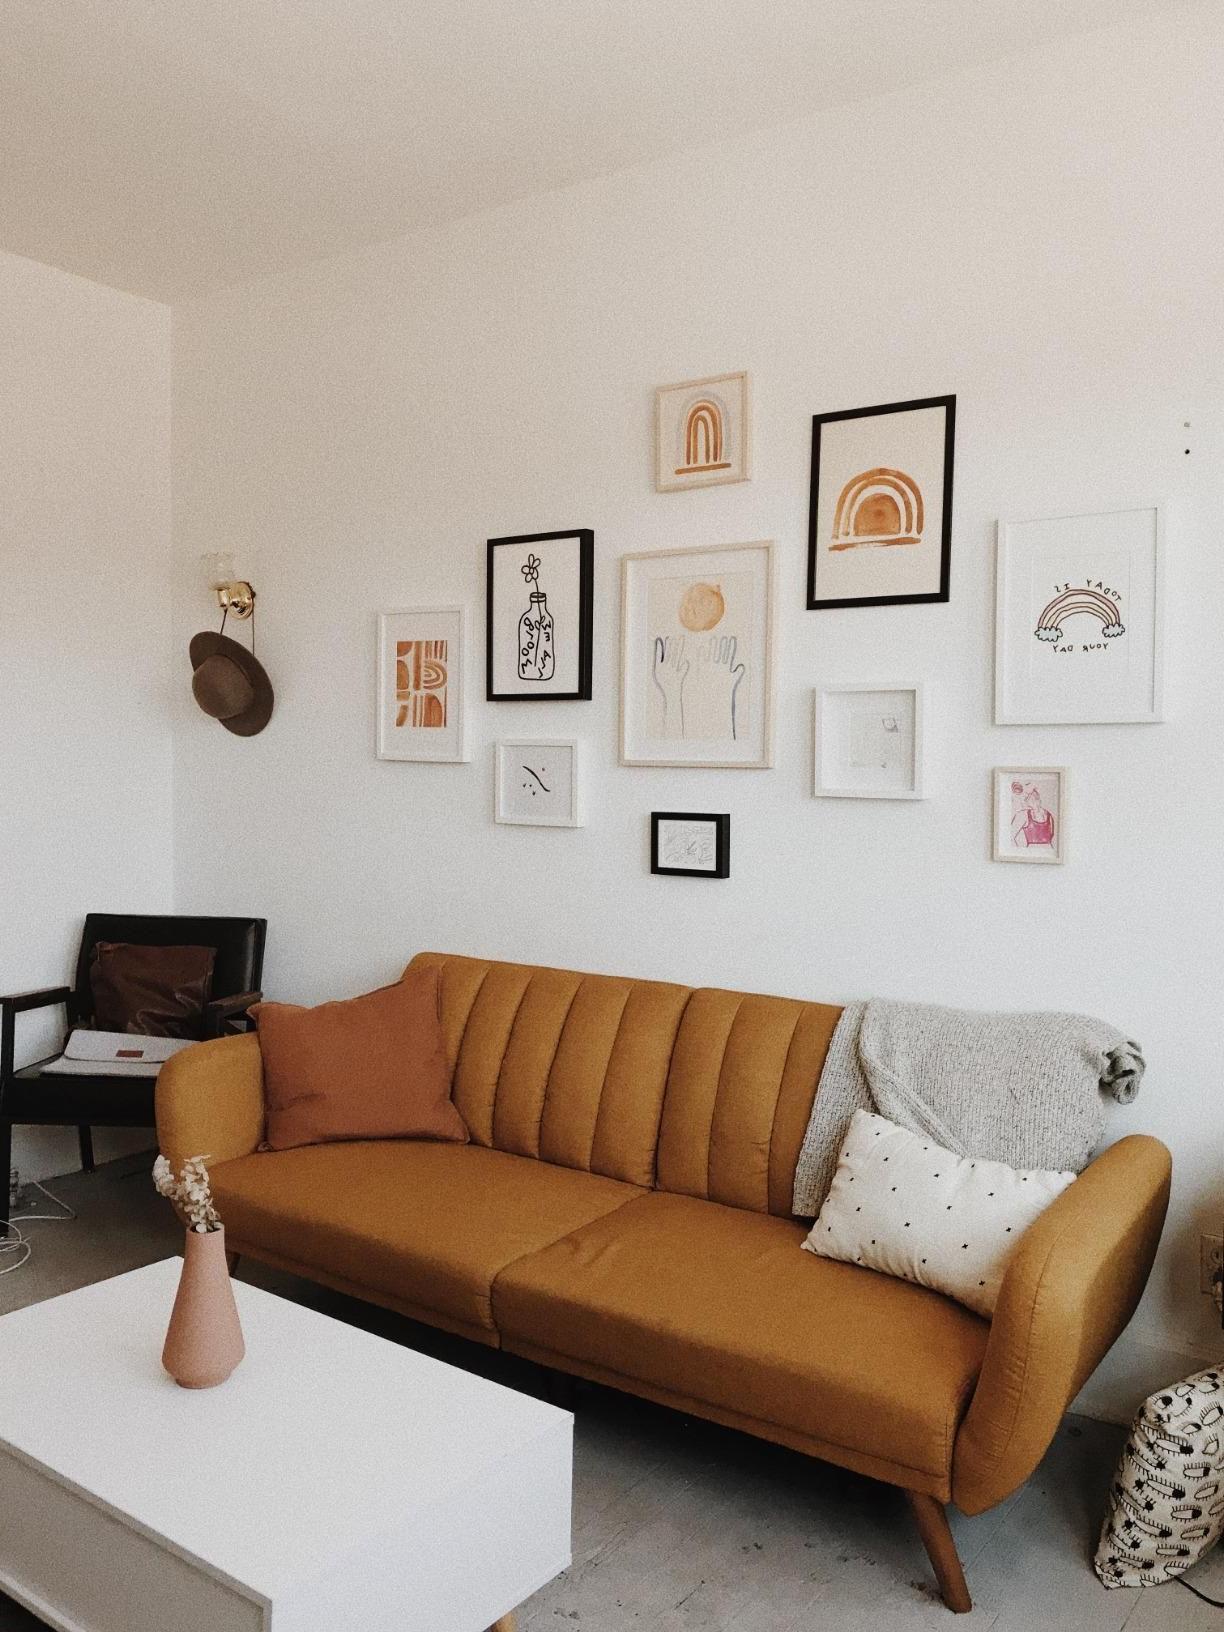 Amazon: Novogratz Brittany Sofa Futon, Premium Linen In Well Known Brittany Sectional Futon Sofas (View 12 of 20)